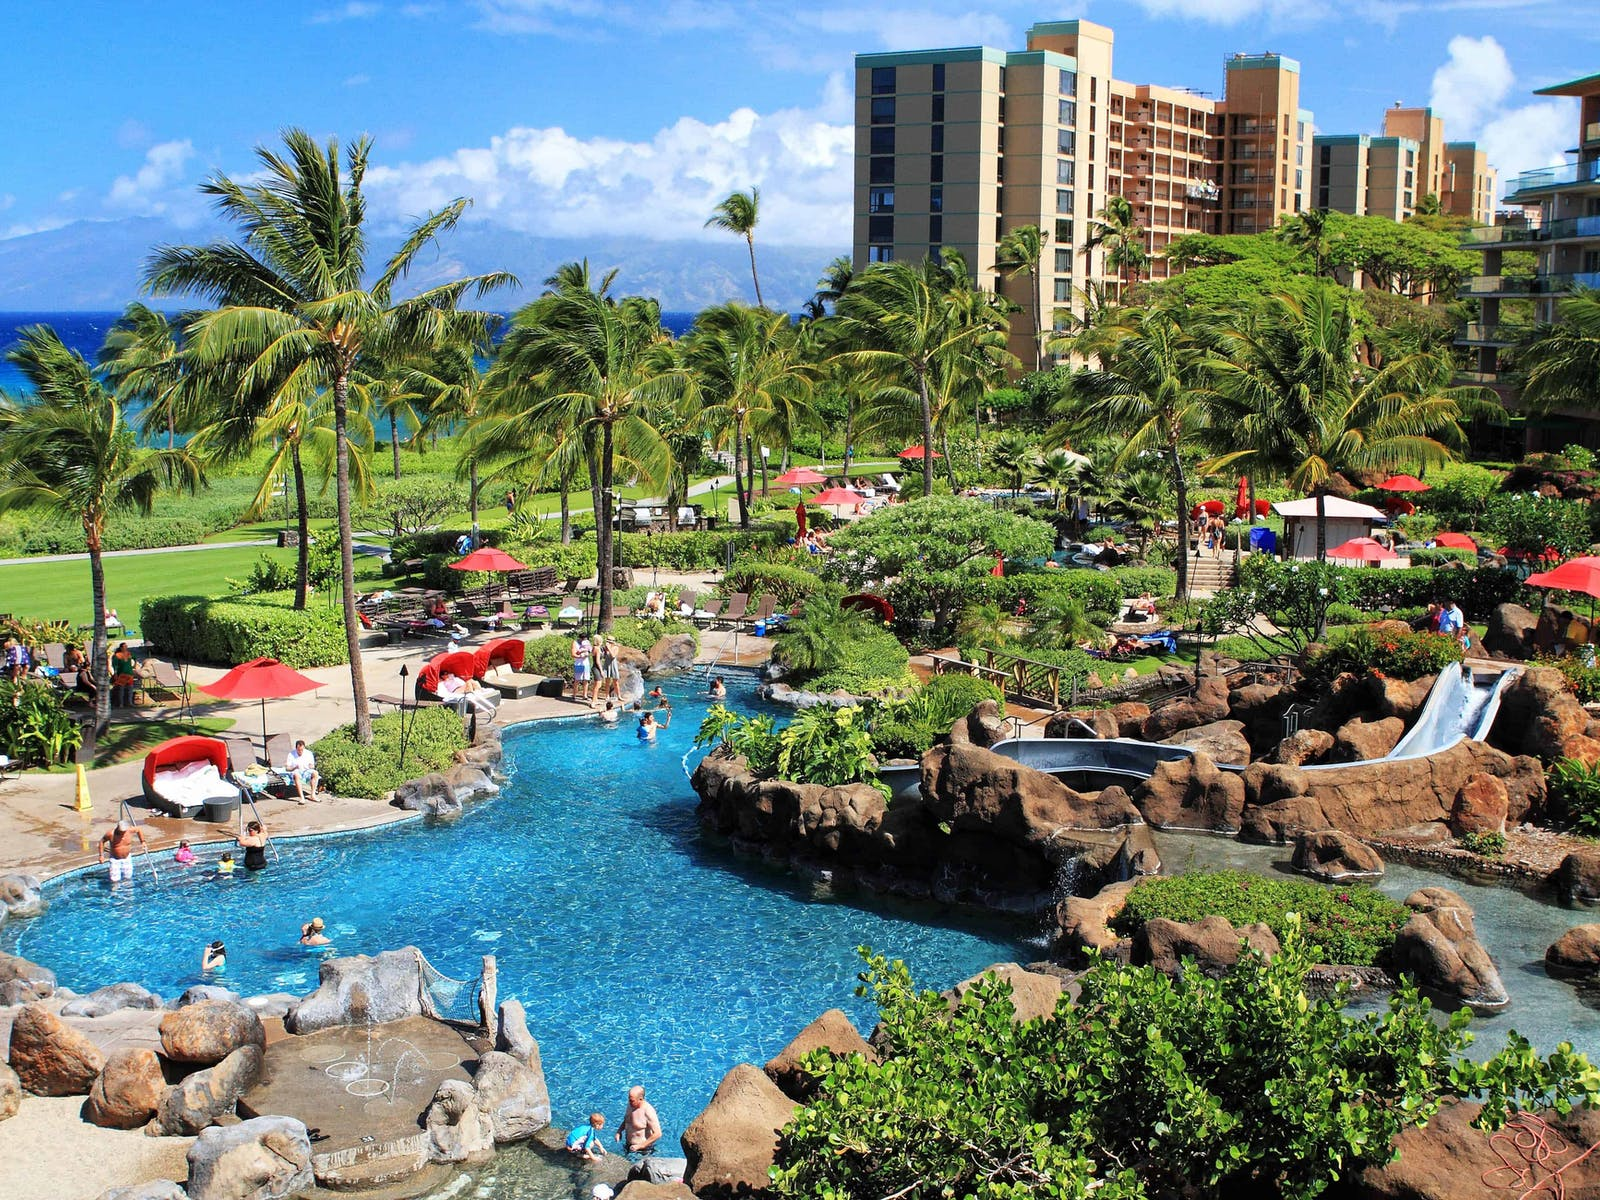 Swimming pool at a beach resort in Kaanapali, Maui